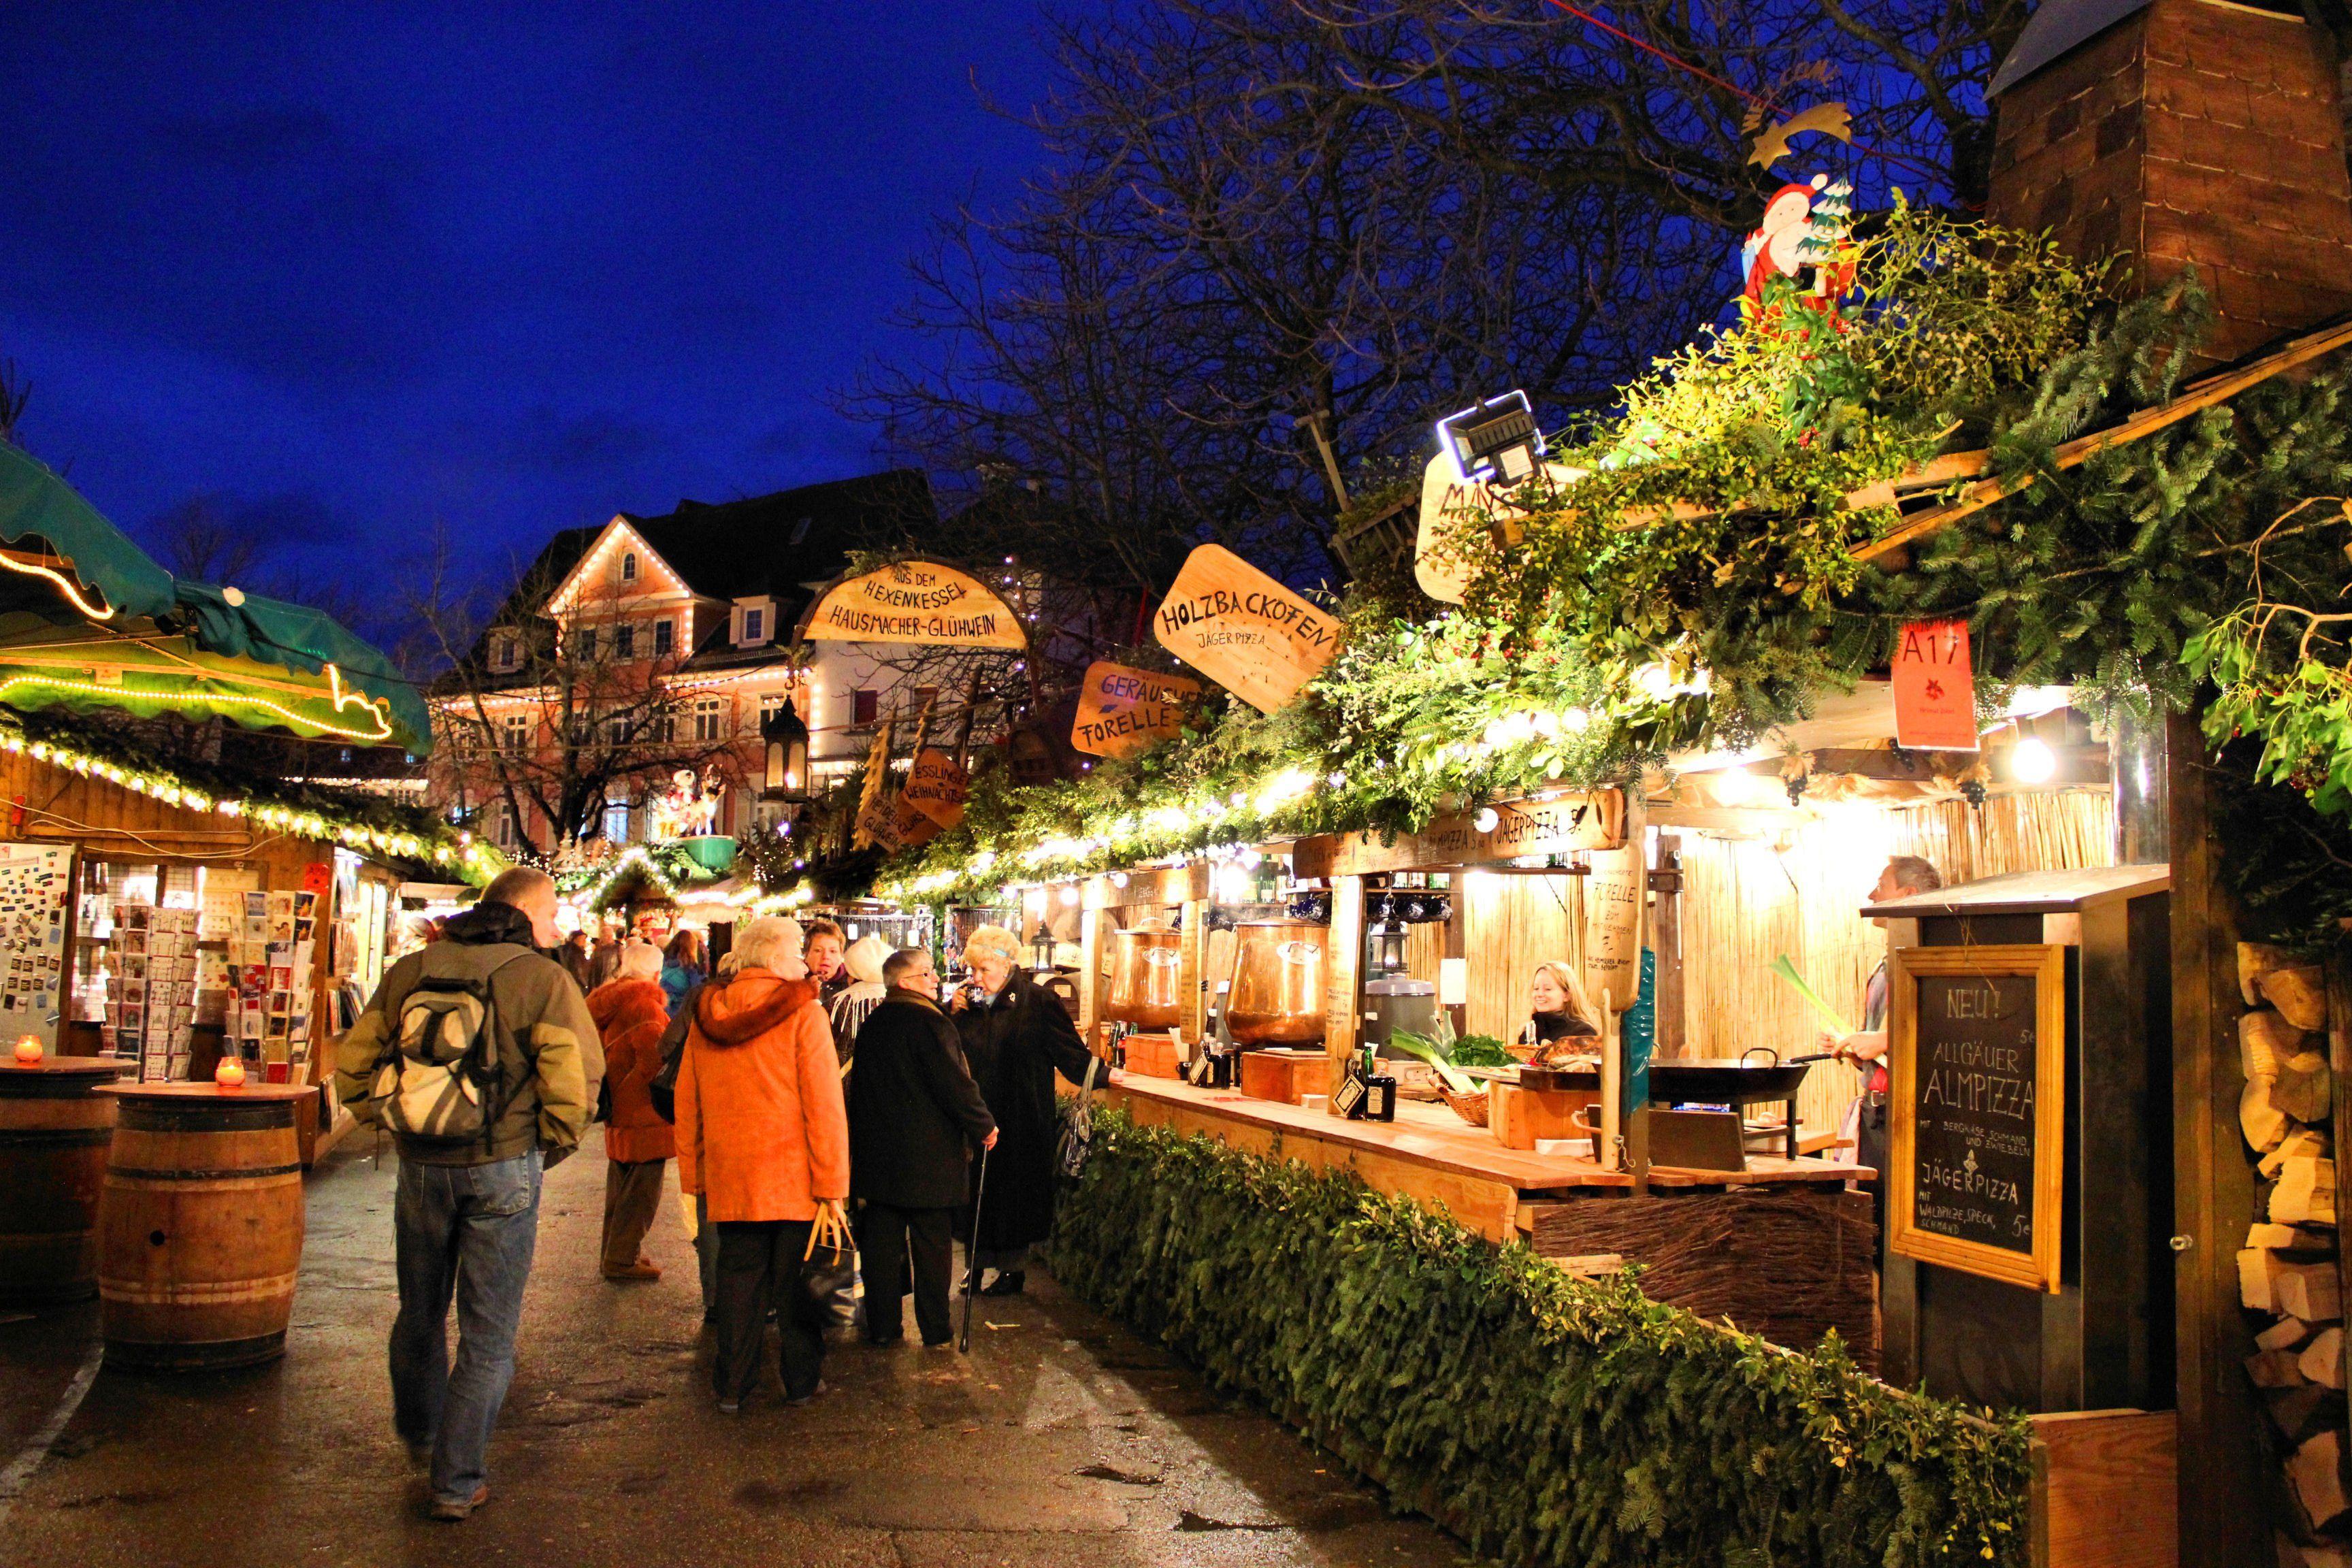 Charlotte Christmas Market.Vacation Photos Part 4 Esslingen Favorite German Town Ever